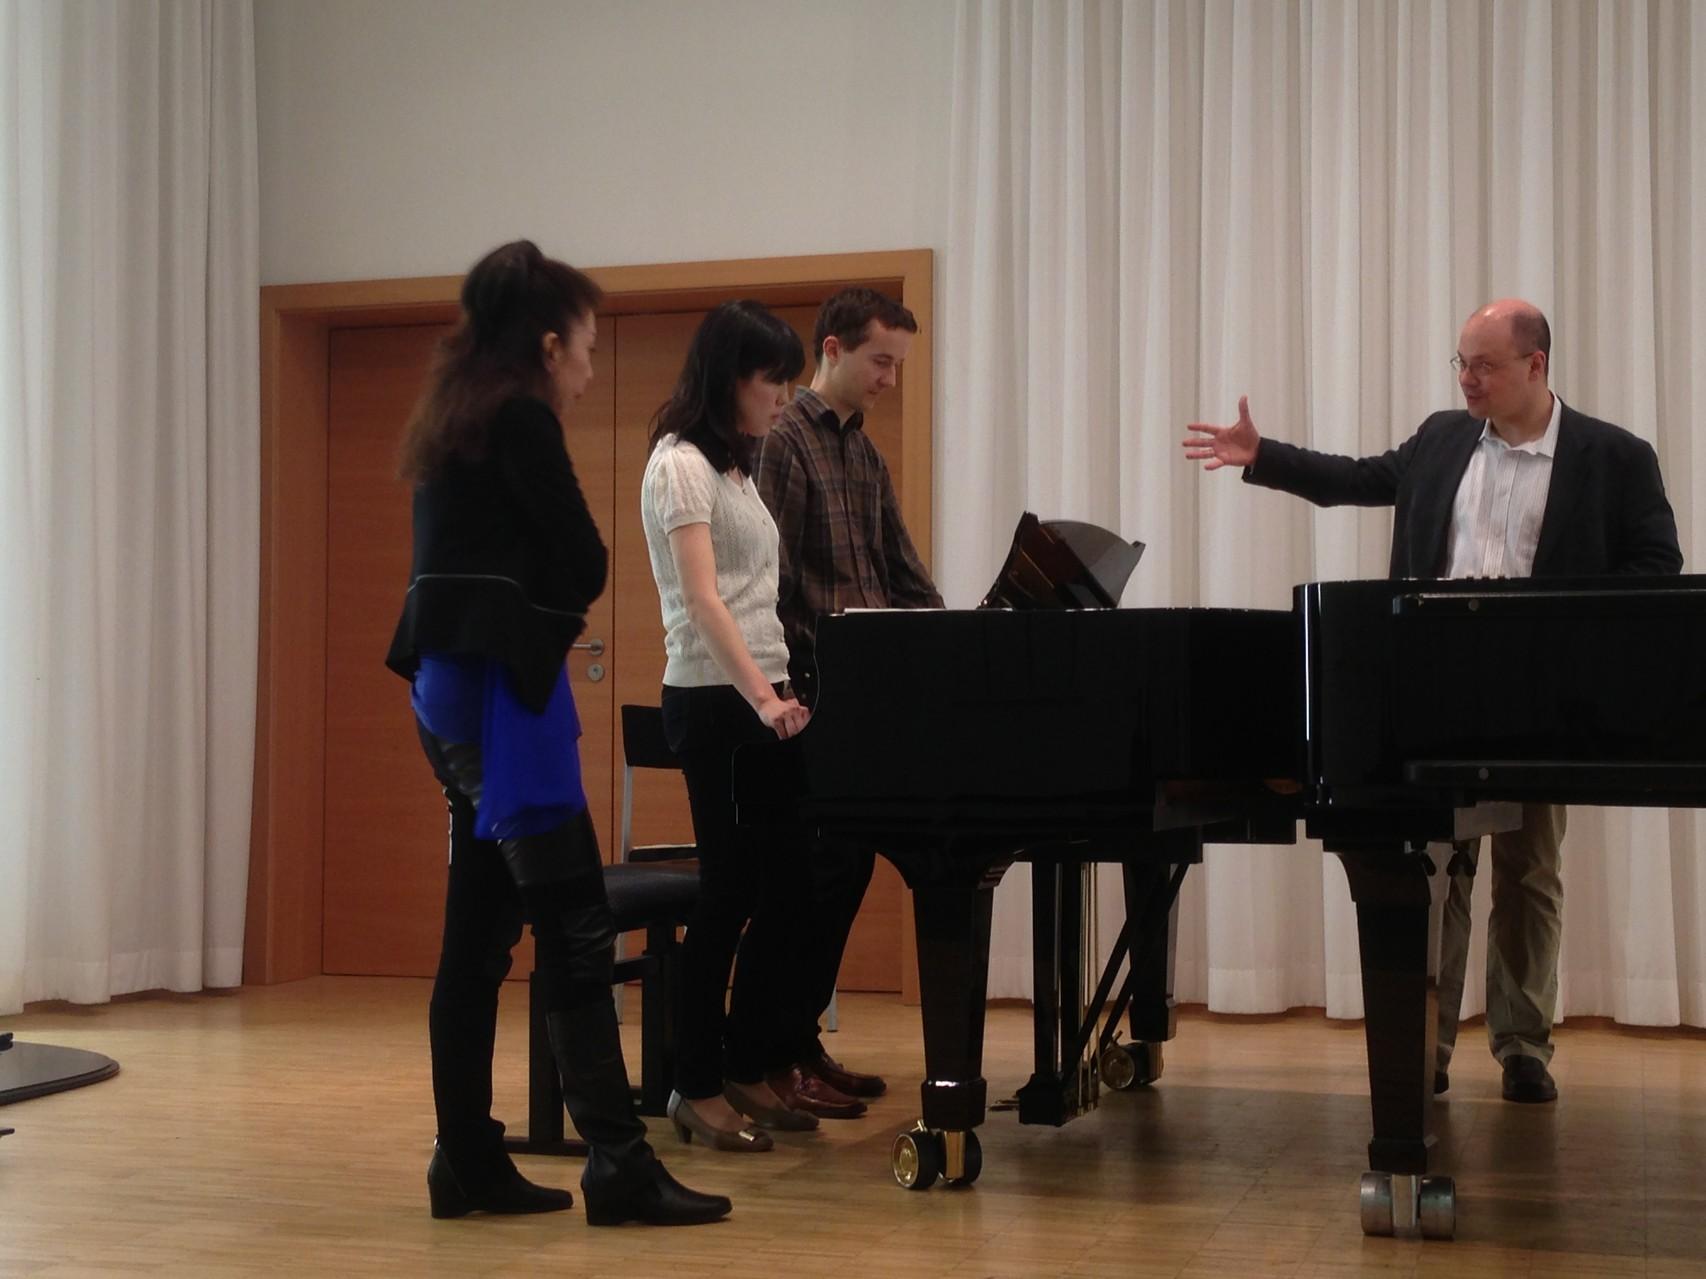 Masterclass Piano, University of Music, Würzburg, 2013 (with Prof. Yumiko Meguri -Tokyo) (Photo: privat)